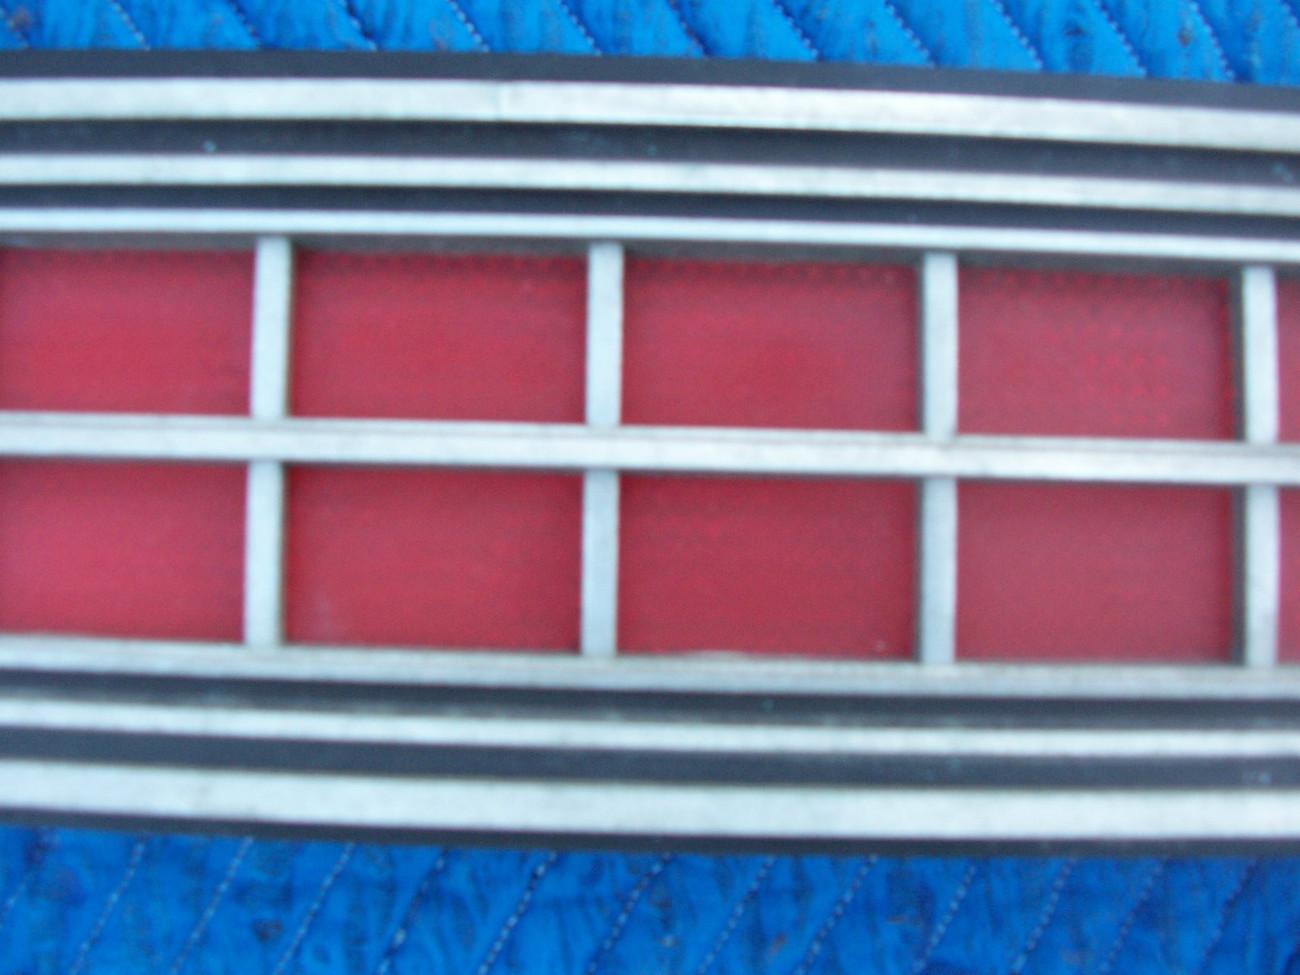 1973 MARQUIS 2 DOOR BROUGHAM CENTER TAILLIGHT REFLECTOR TRIM PANEL OEM USED ORIG image 4